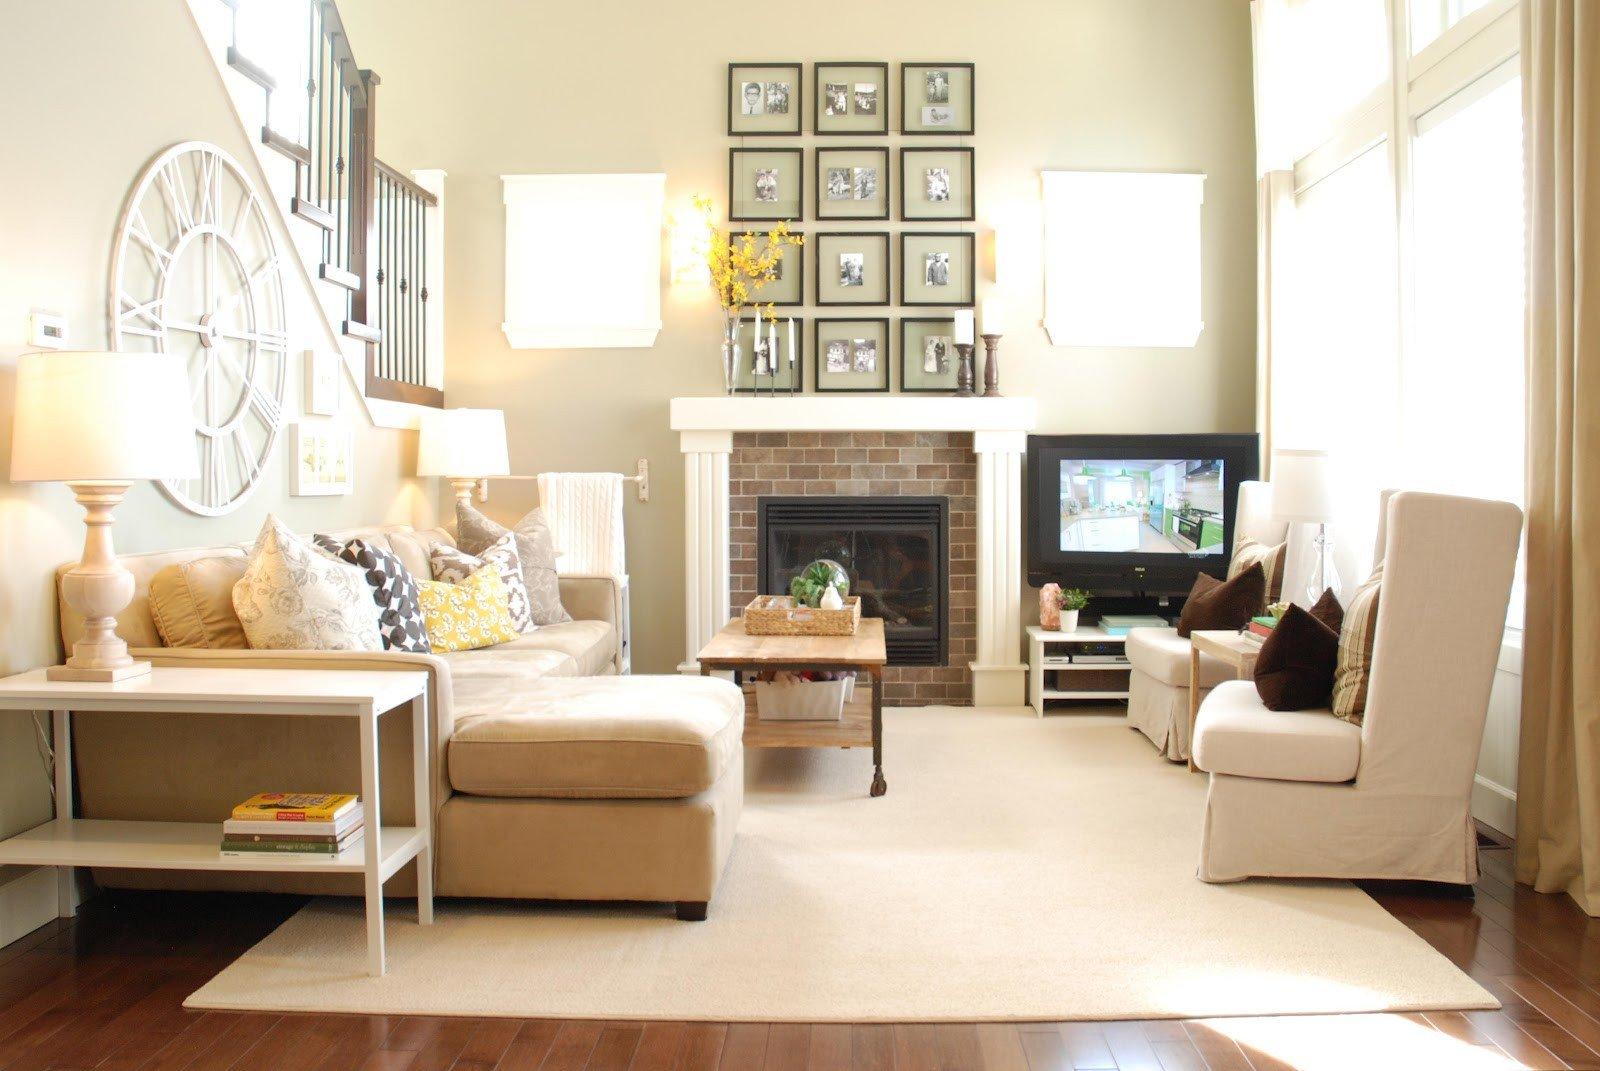 Small Living Room Decor Ideas 74 Small Living Room Design Ideas